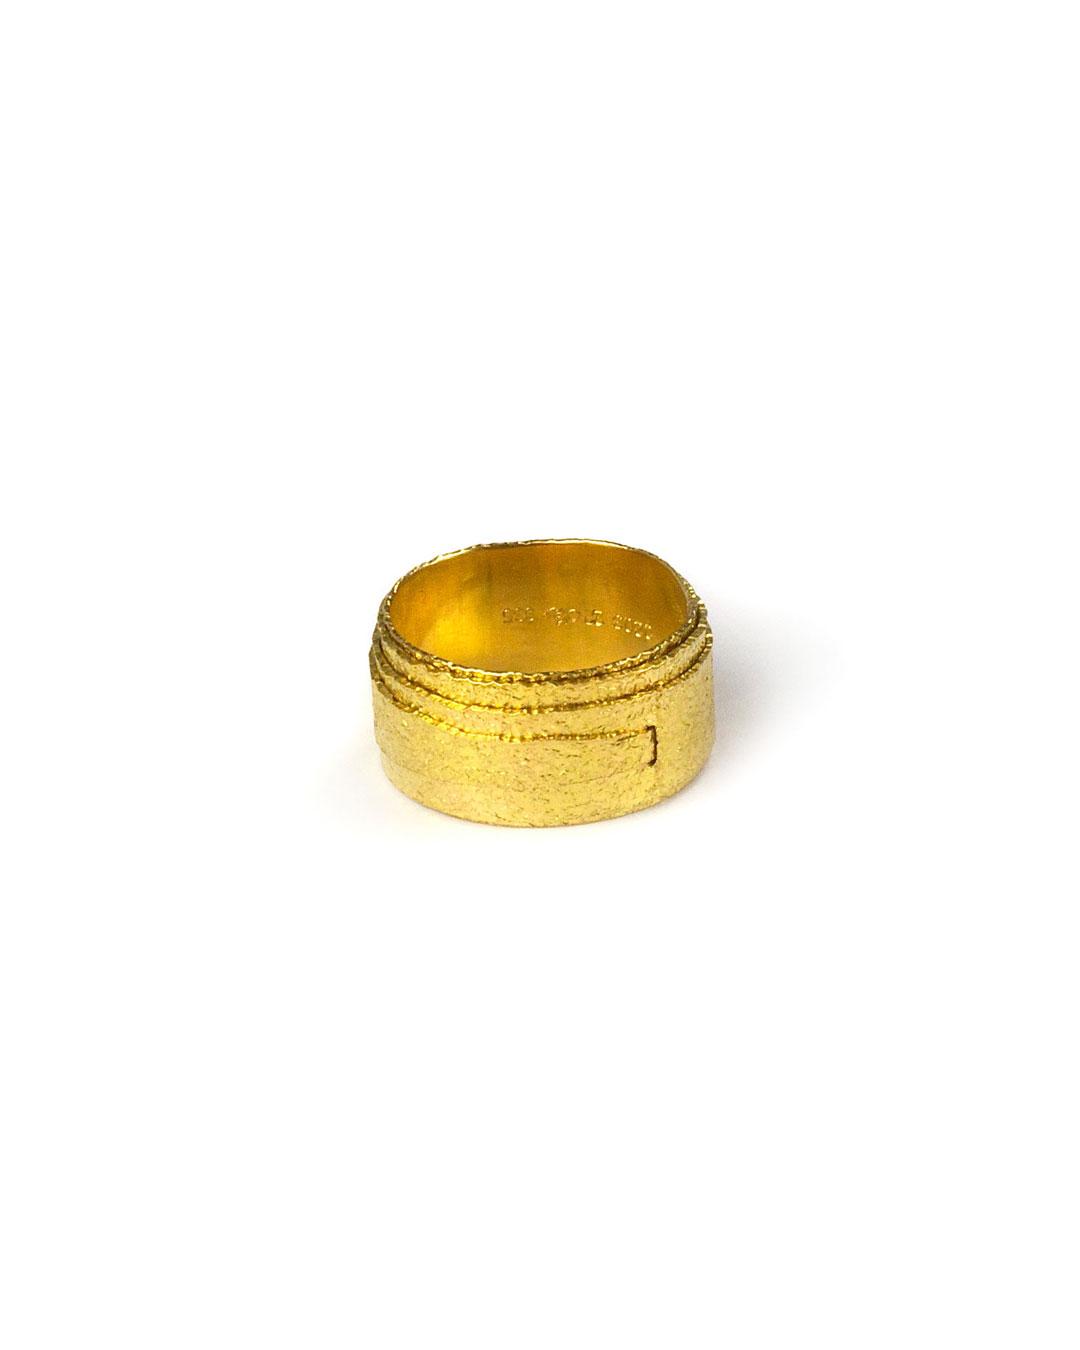 Okinari Kurokawa, untitled, 1997, ring; 20ct gold, ø 20 x 10 mm, €1500